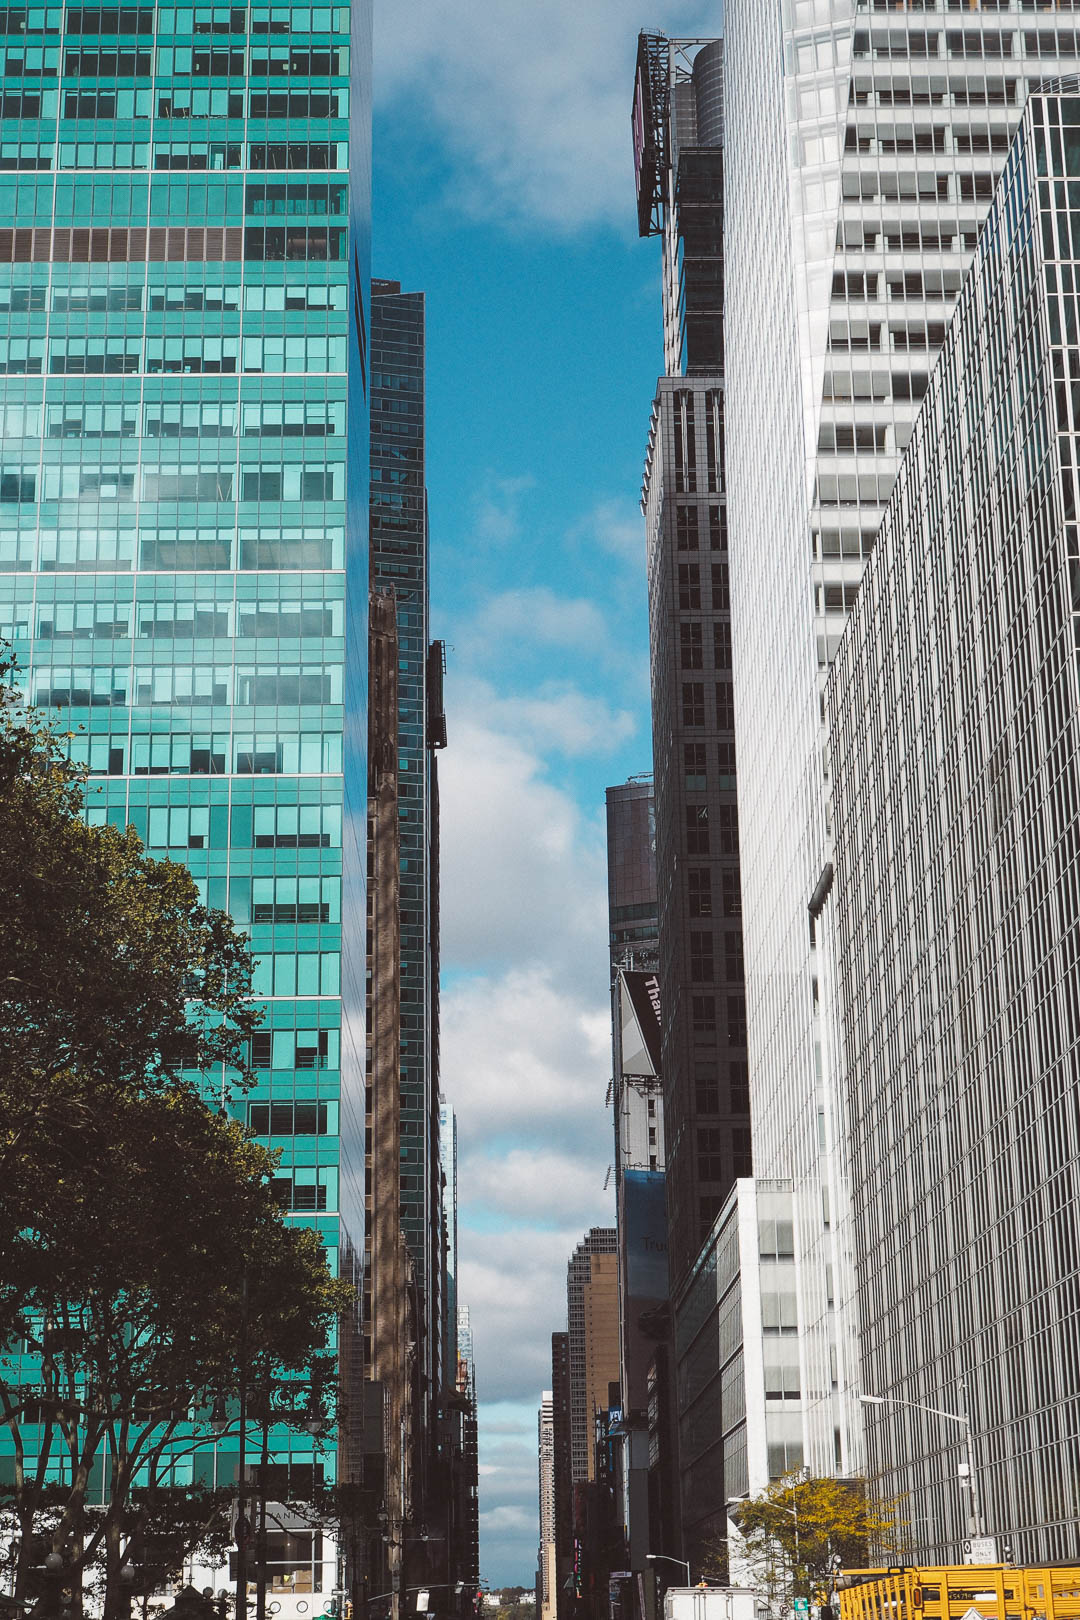 newyork-5-of-171